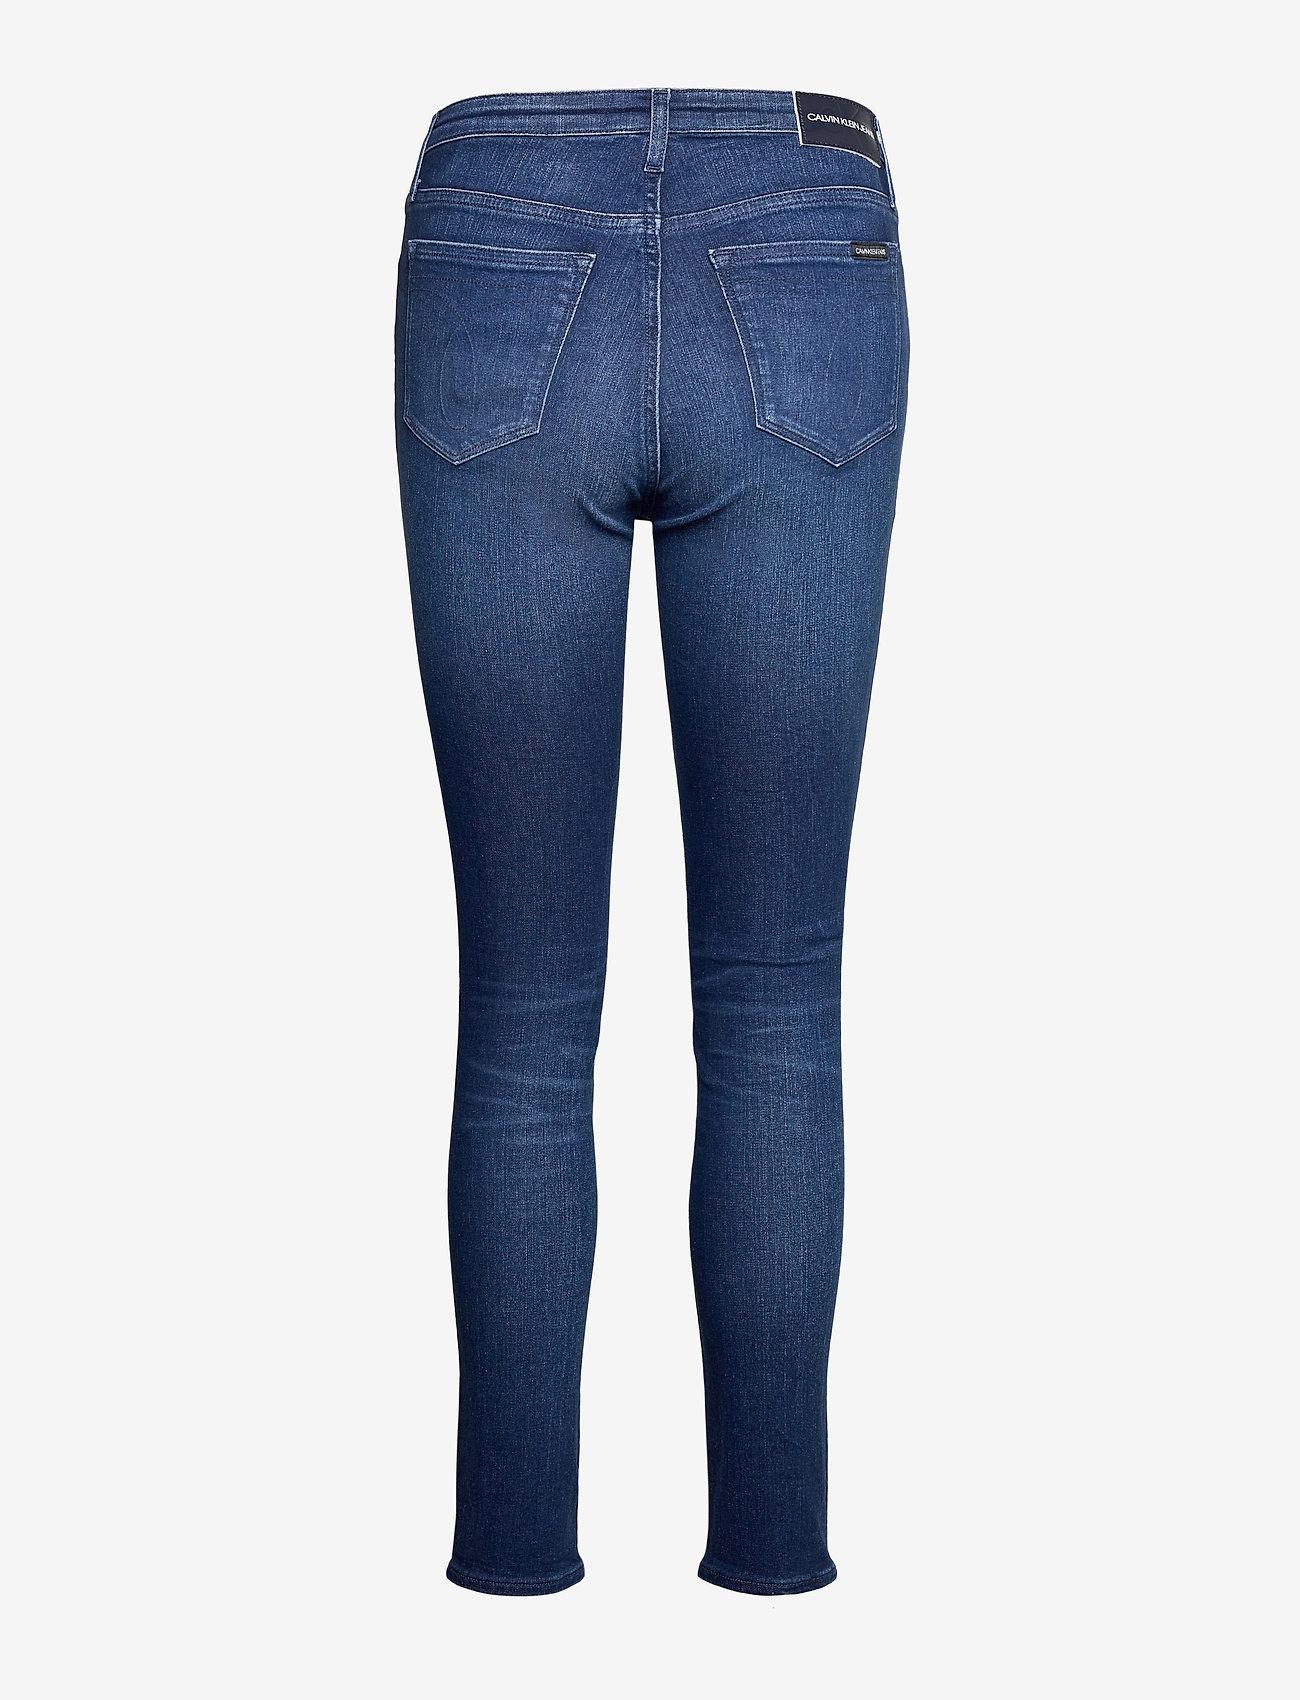 Calvin Klein Jeans - CKJ 010 HIGH RISE SKINNY - skinny jeans - ca060 mid blue - 1